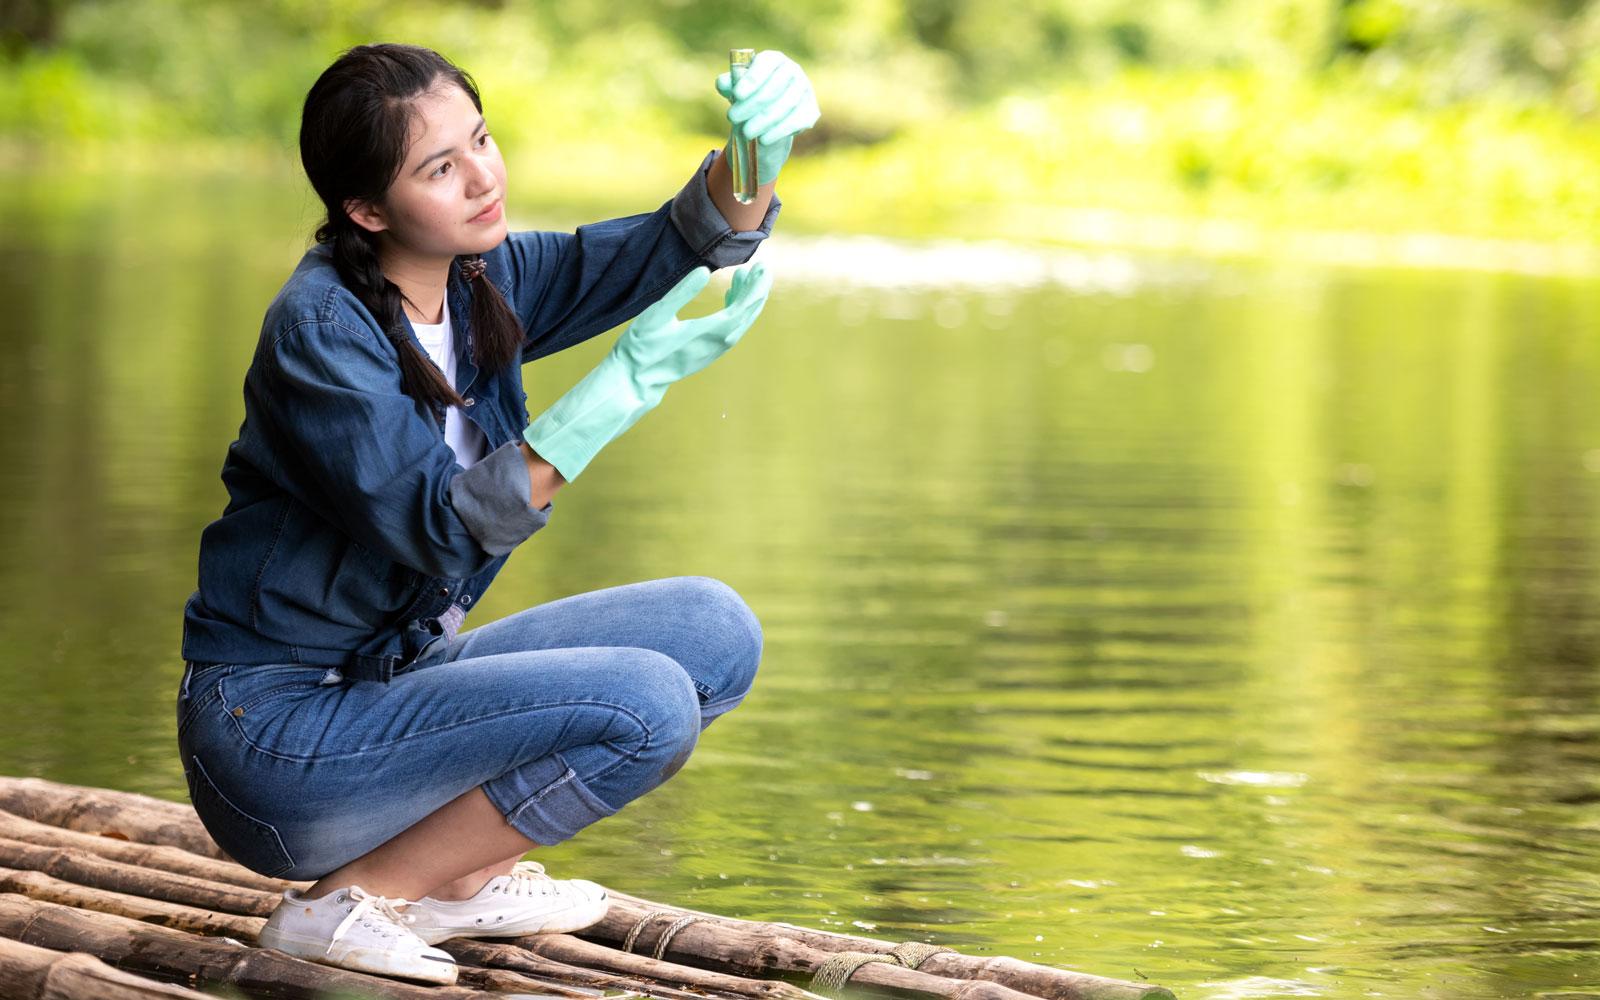 Environmental scientist taking water samples